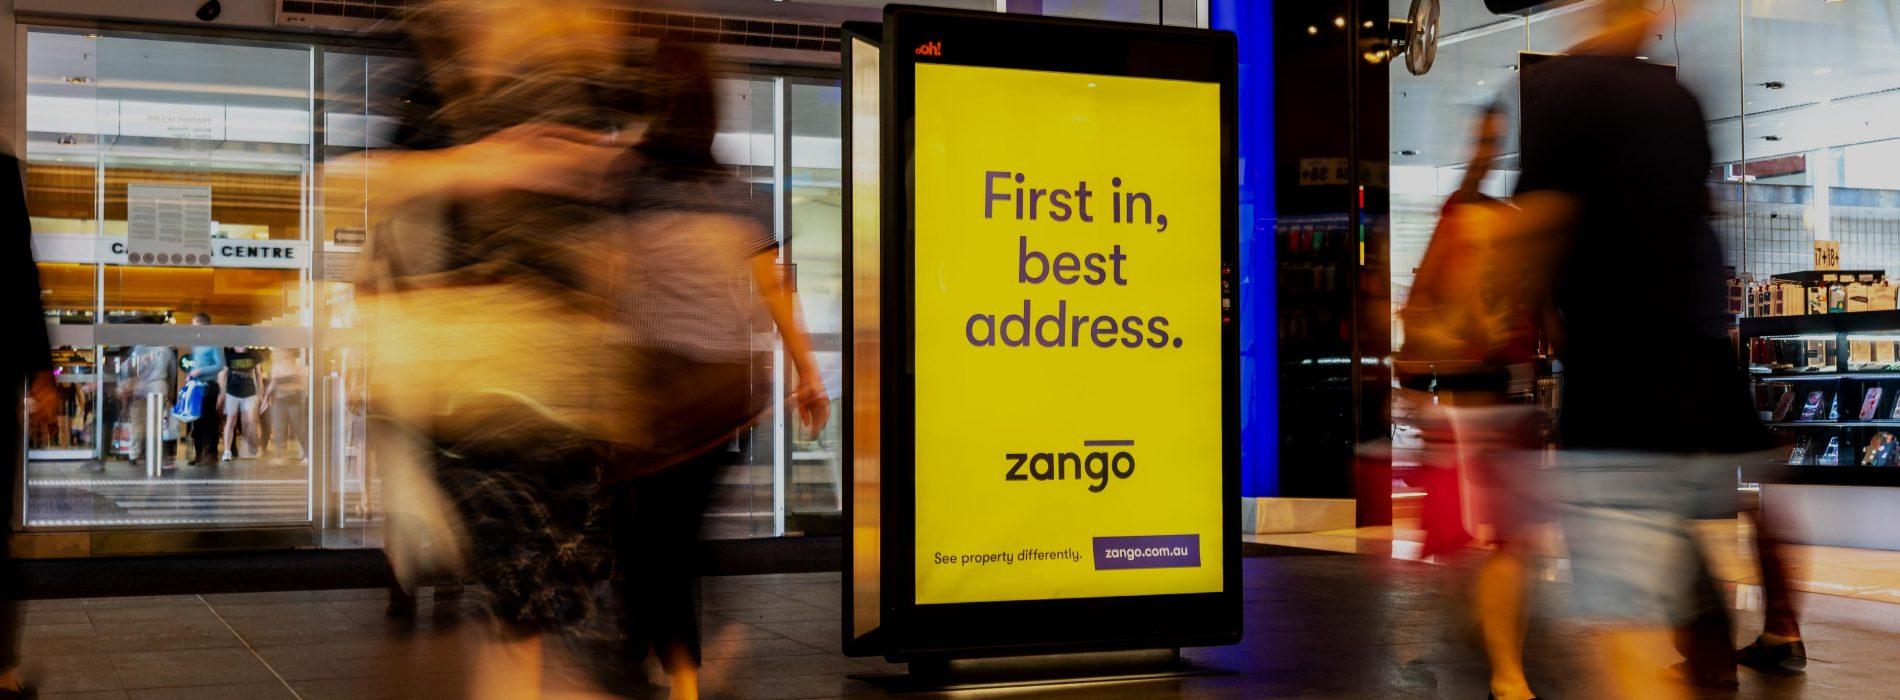 Zango banner image